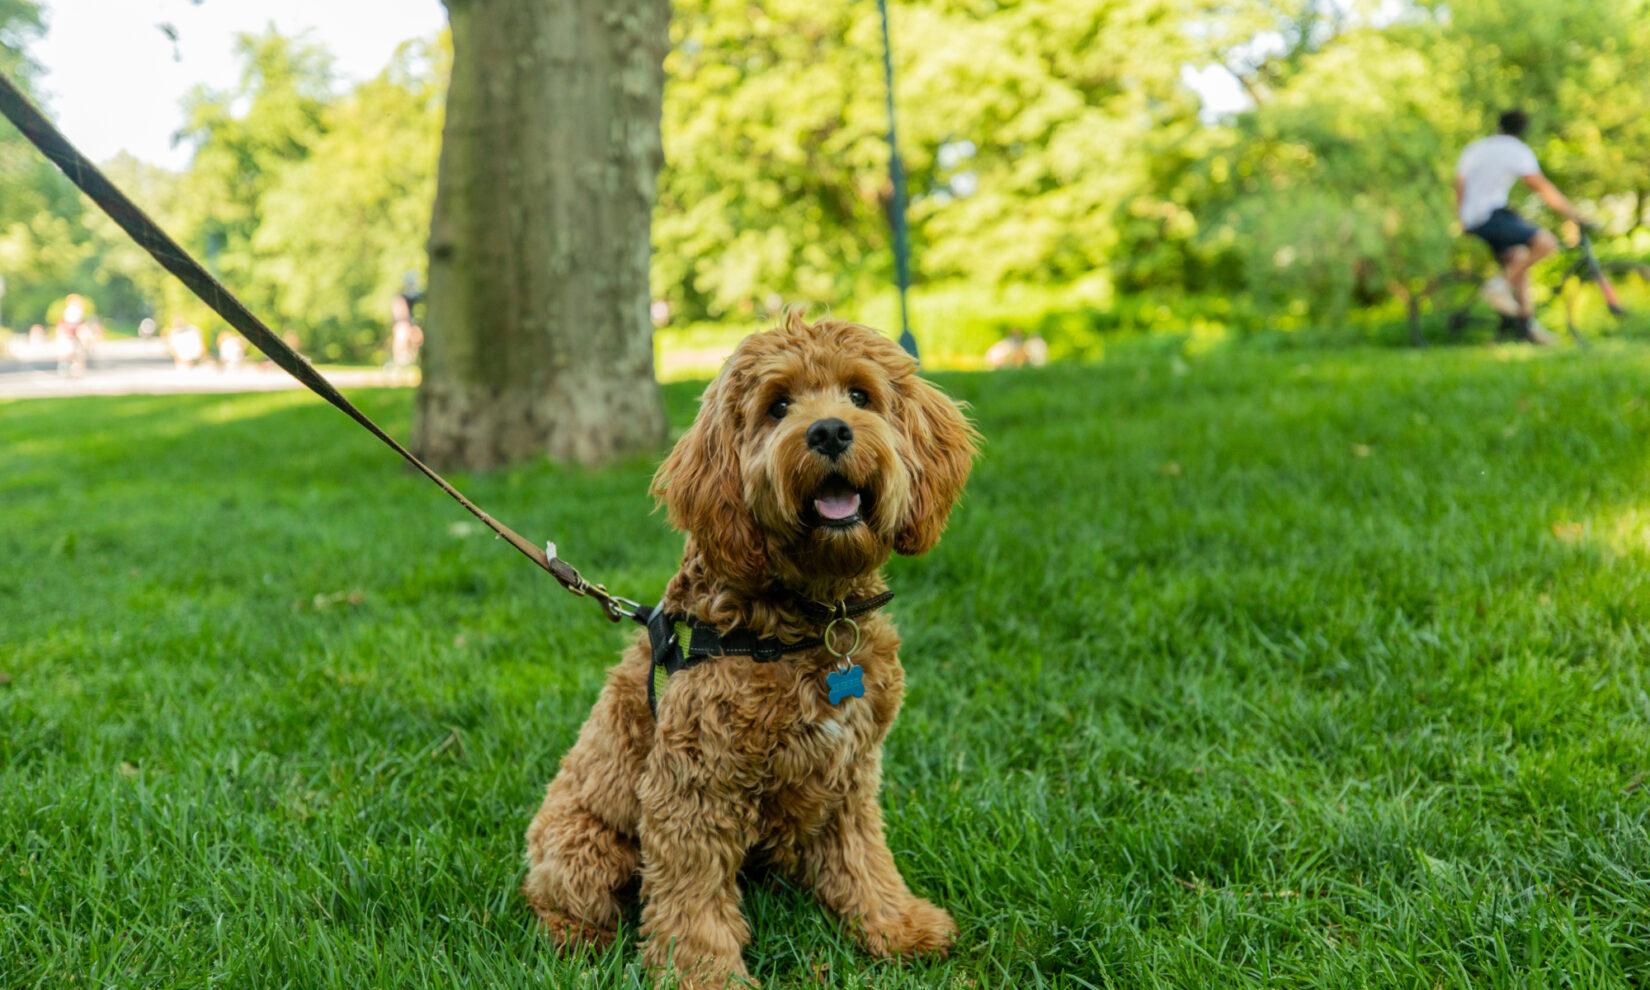 A leashed dog enjoys the shade of a Park tree.